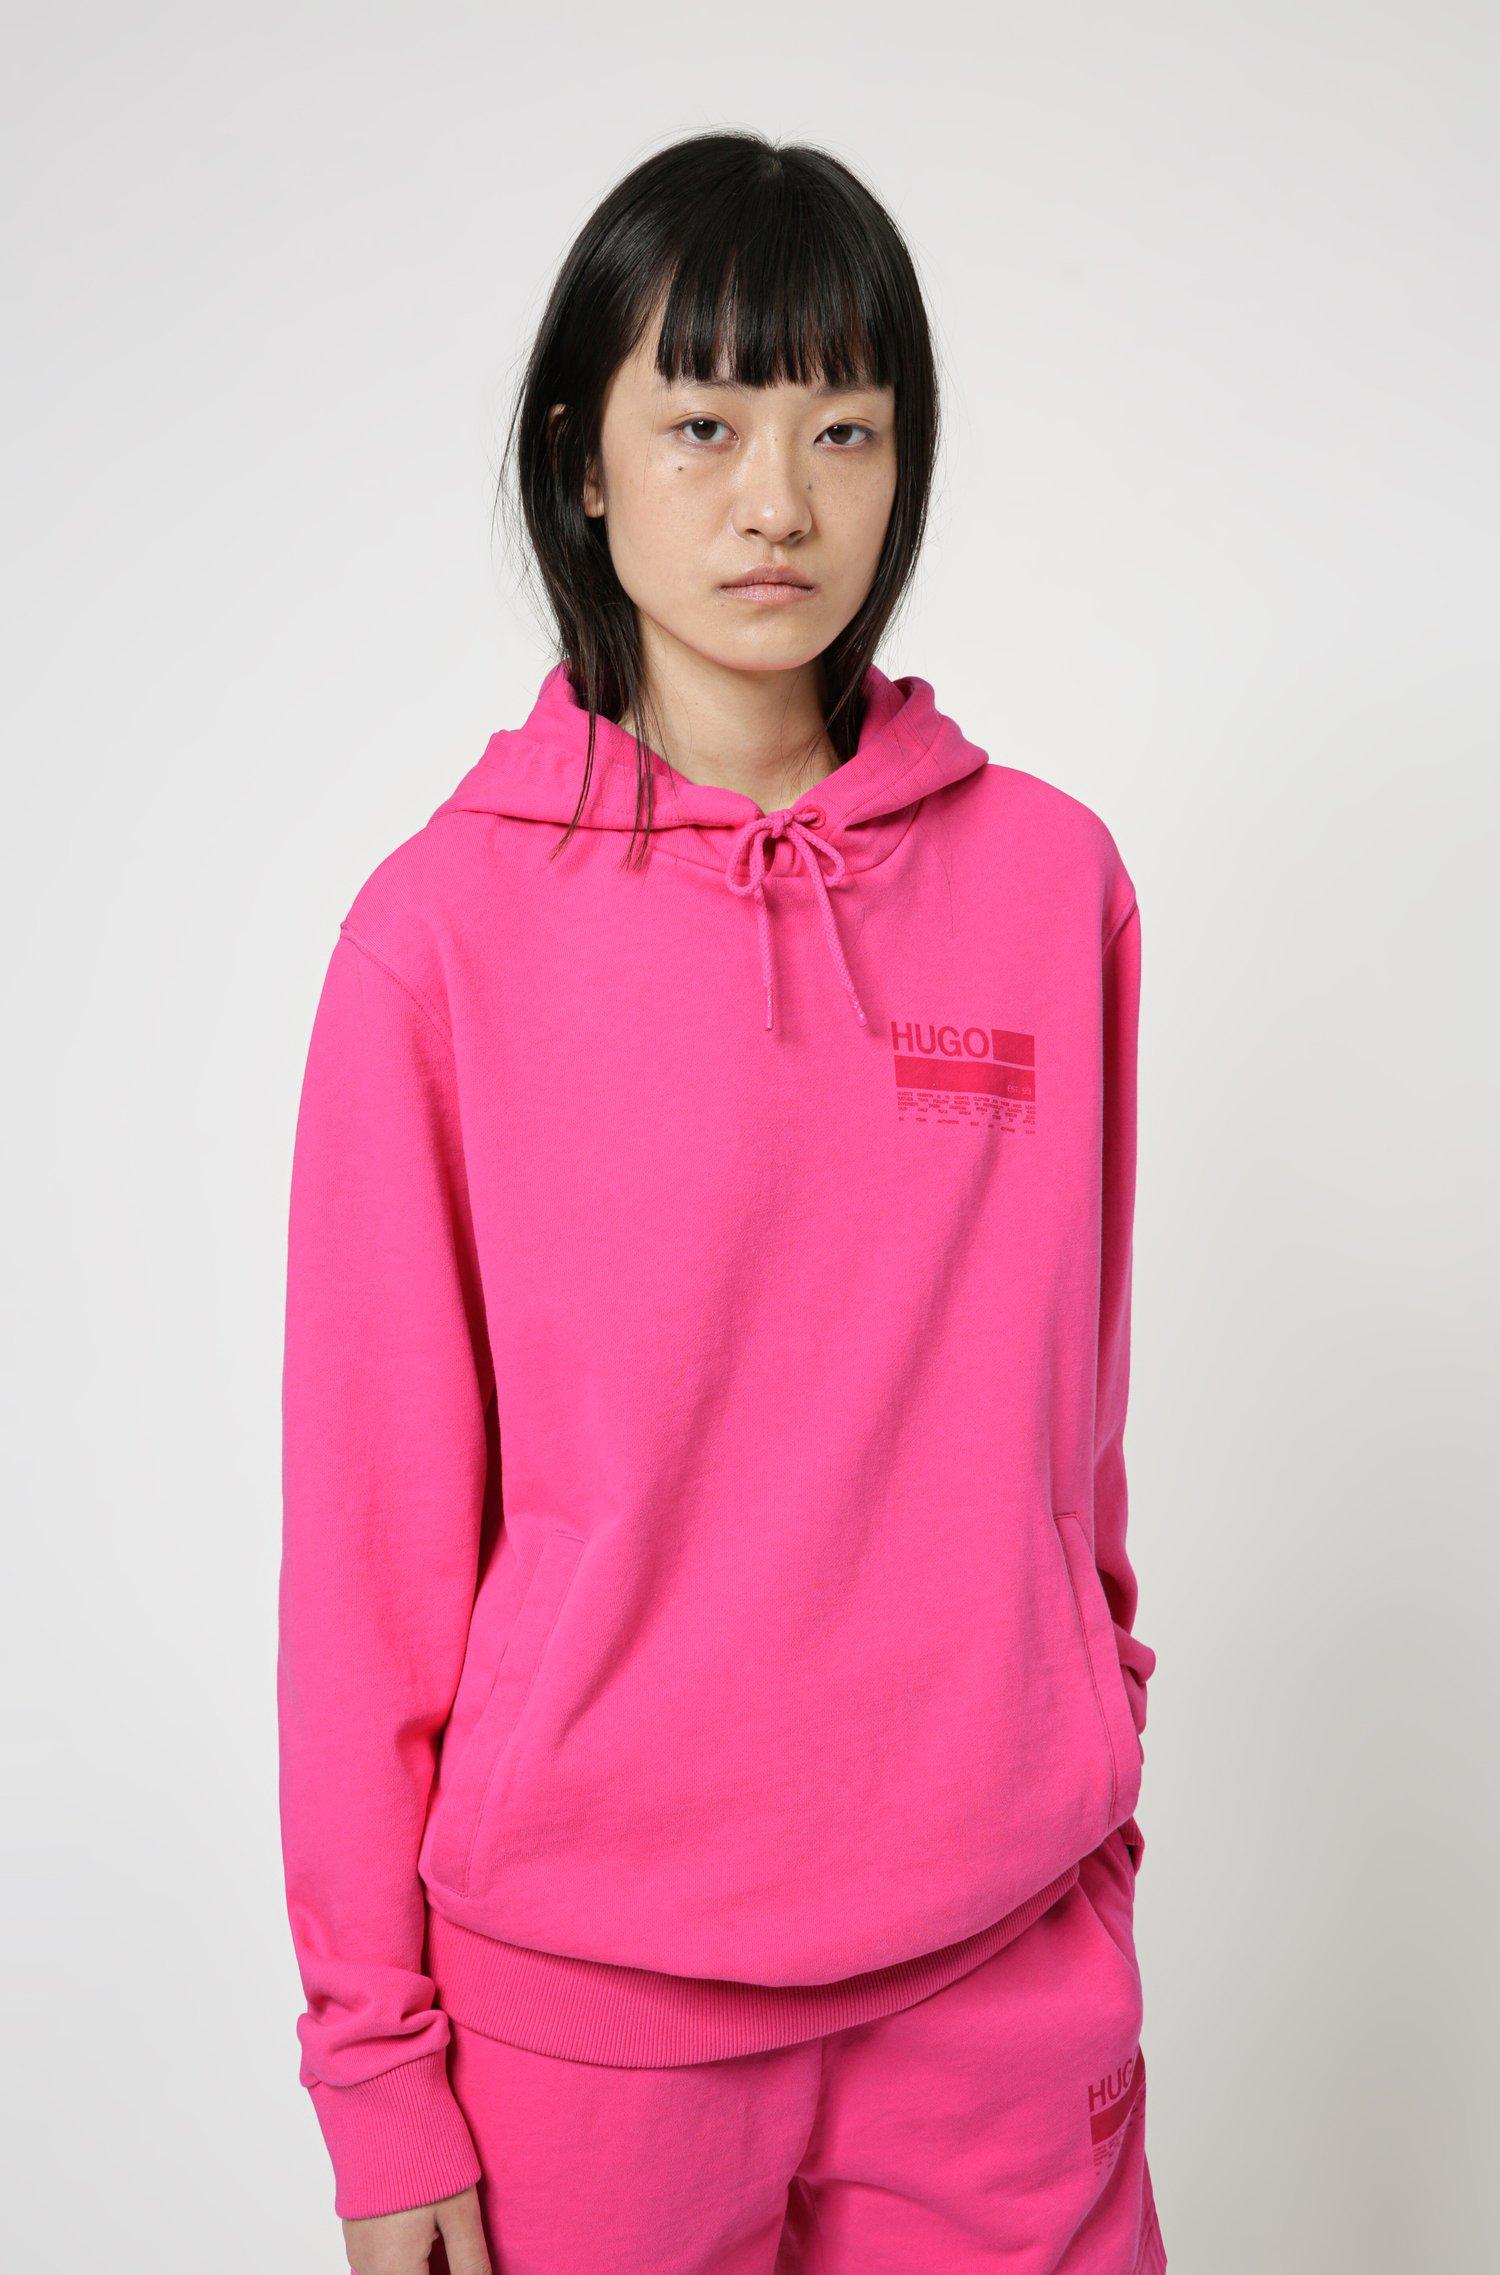 Manifesto-print hooded sweatshirt in Recot²® cotton, Pink